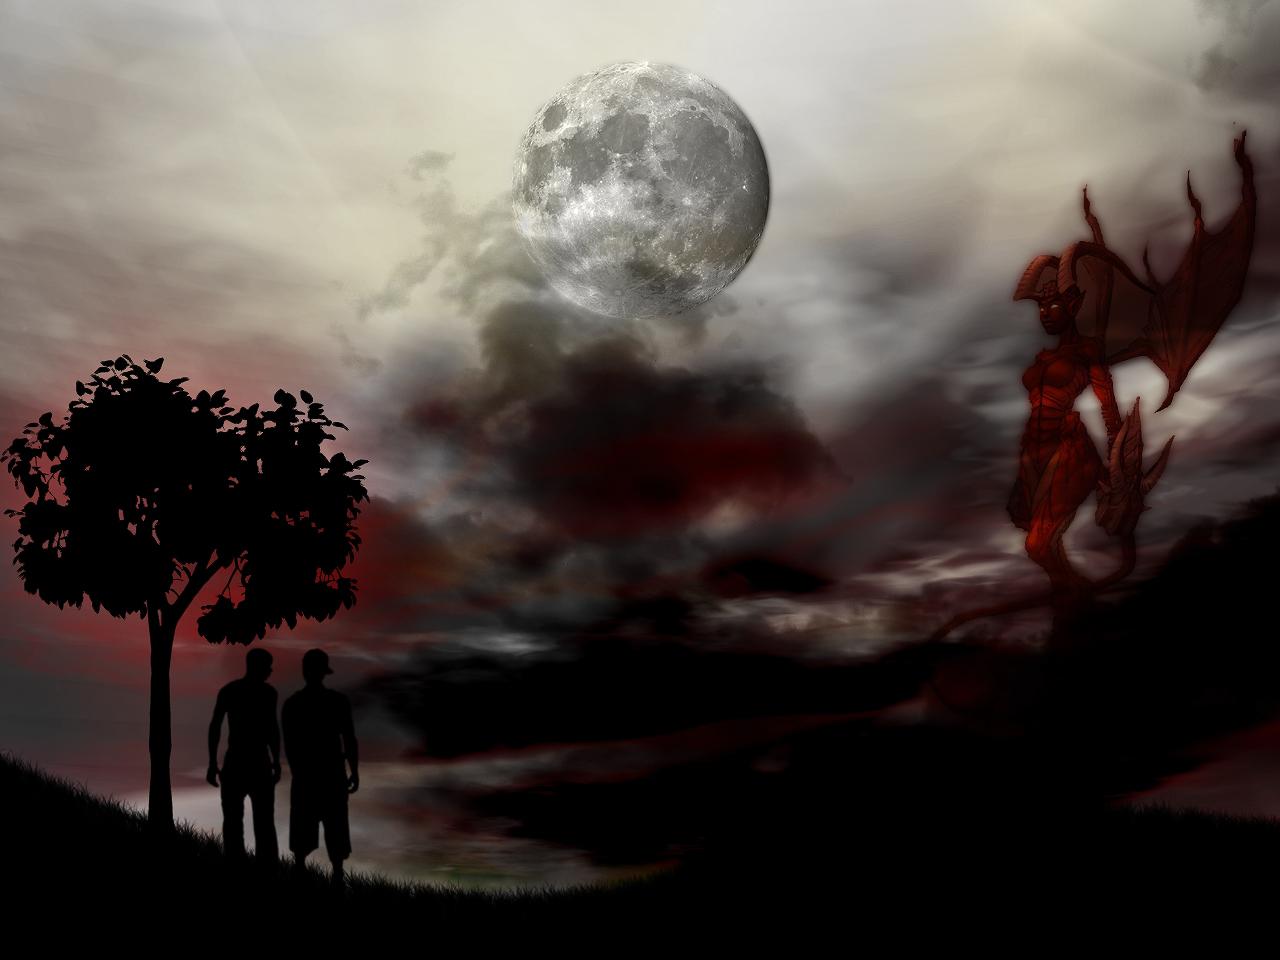 bonewallpaper - best desktop hd wallpapers: devil desktop wallpapers